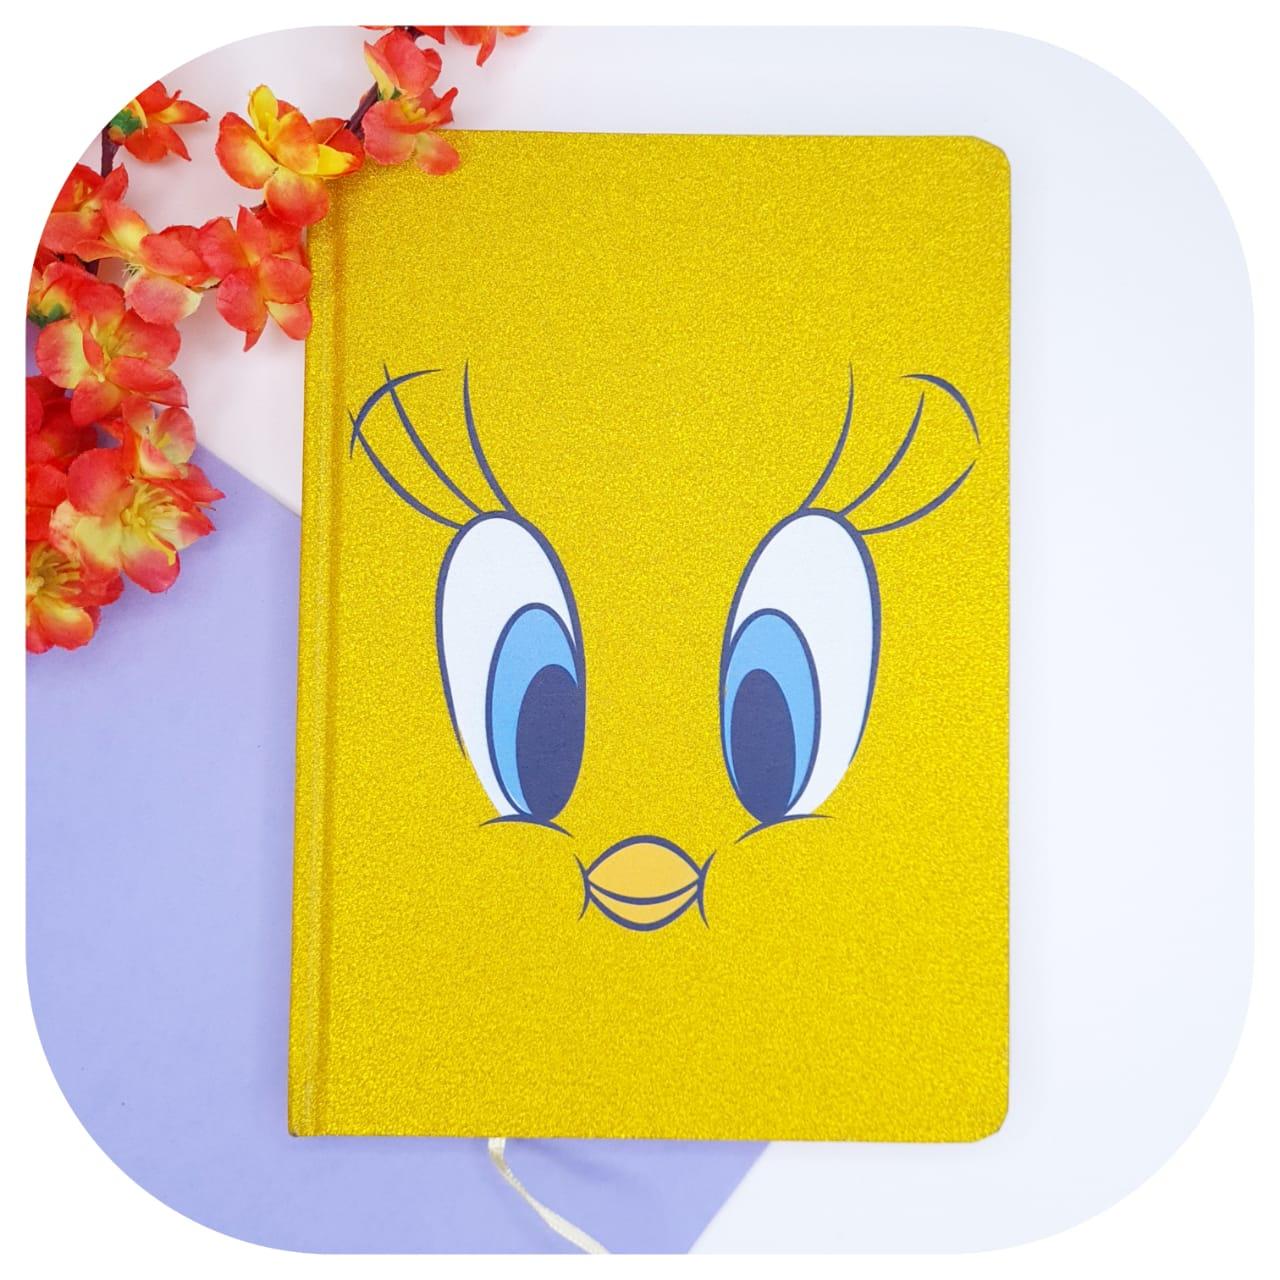 Caderno Piu Piu capa dura e com glitter